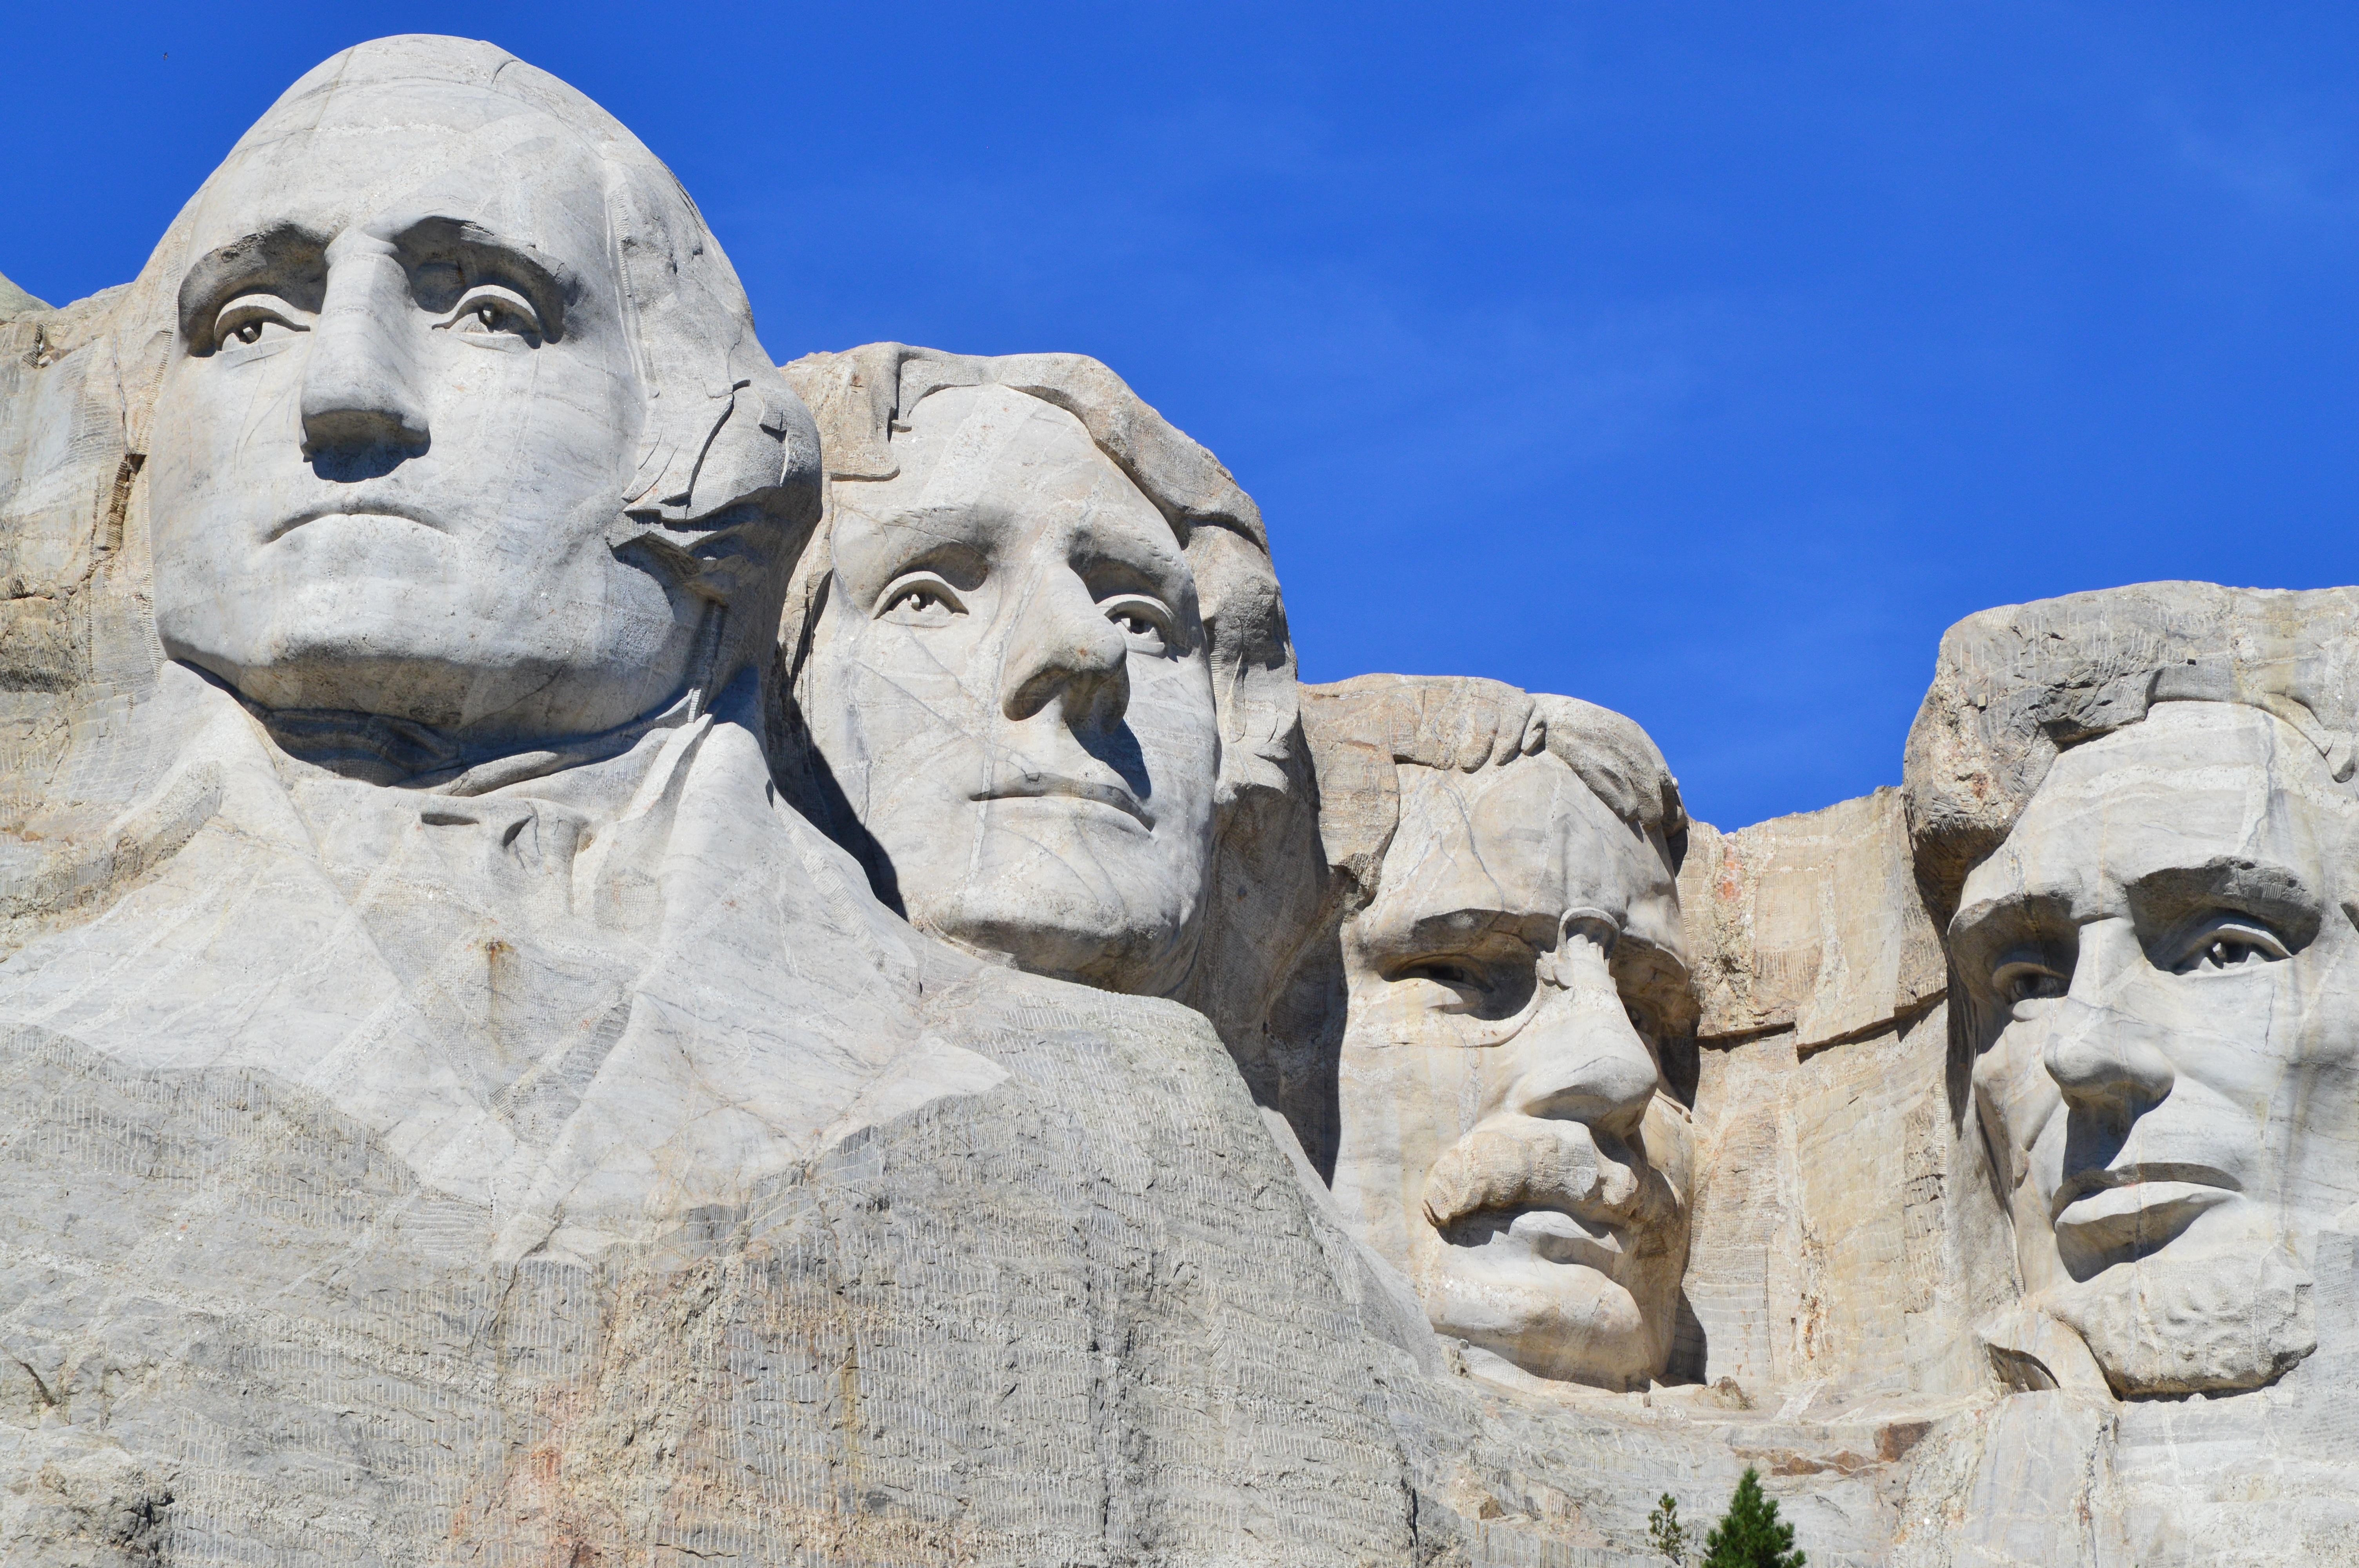 image Celebrating presidents day with a sloppy blowjob